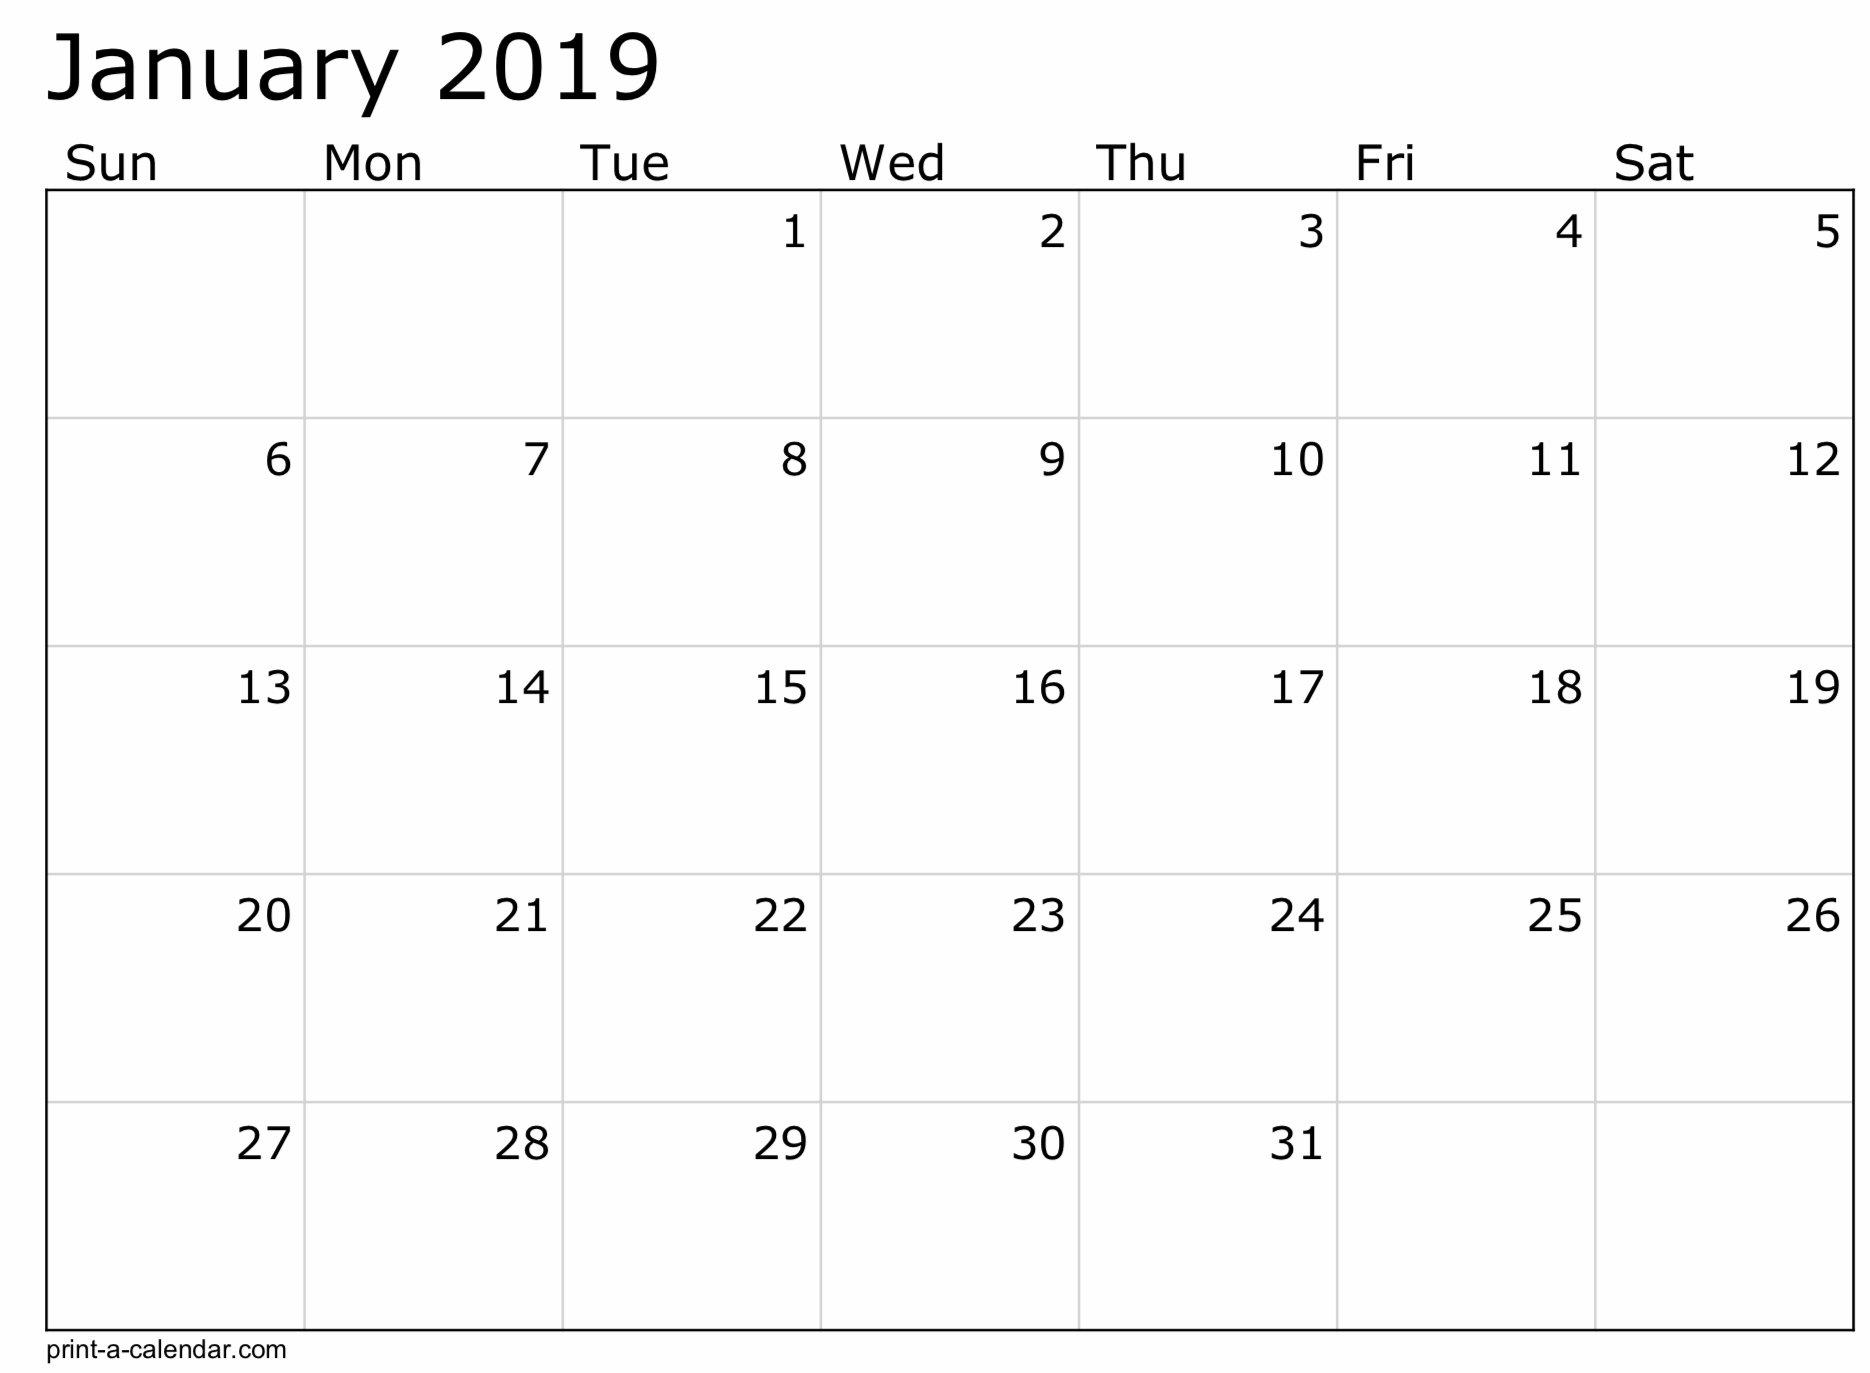 8 X 11 Calendar Template | Free Calendar Template Example Blank Calendar Template Printable 8 1/2 X 11